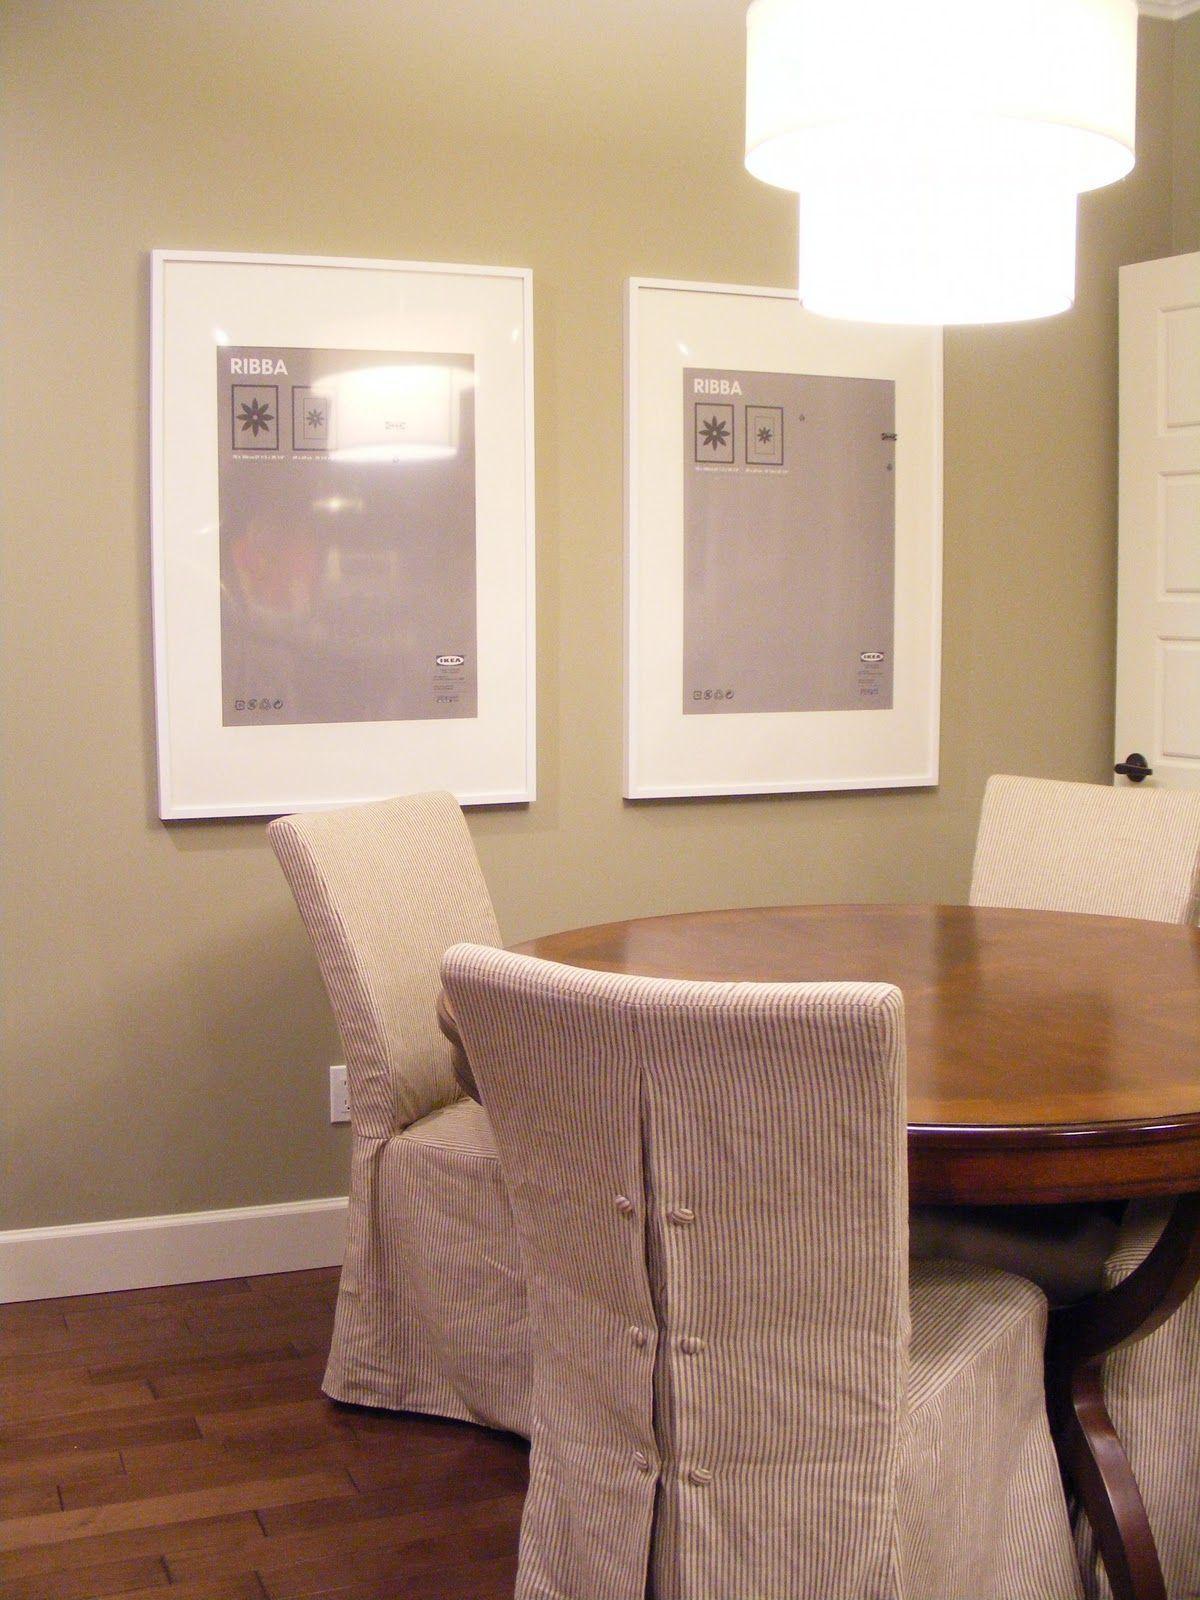 White Modern Dining Room Chair Slipcovers  House Diy Cool Dining Room Chair Covers Round Back Design Inspiration